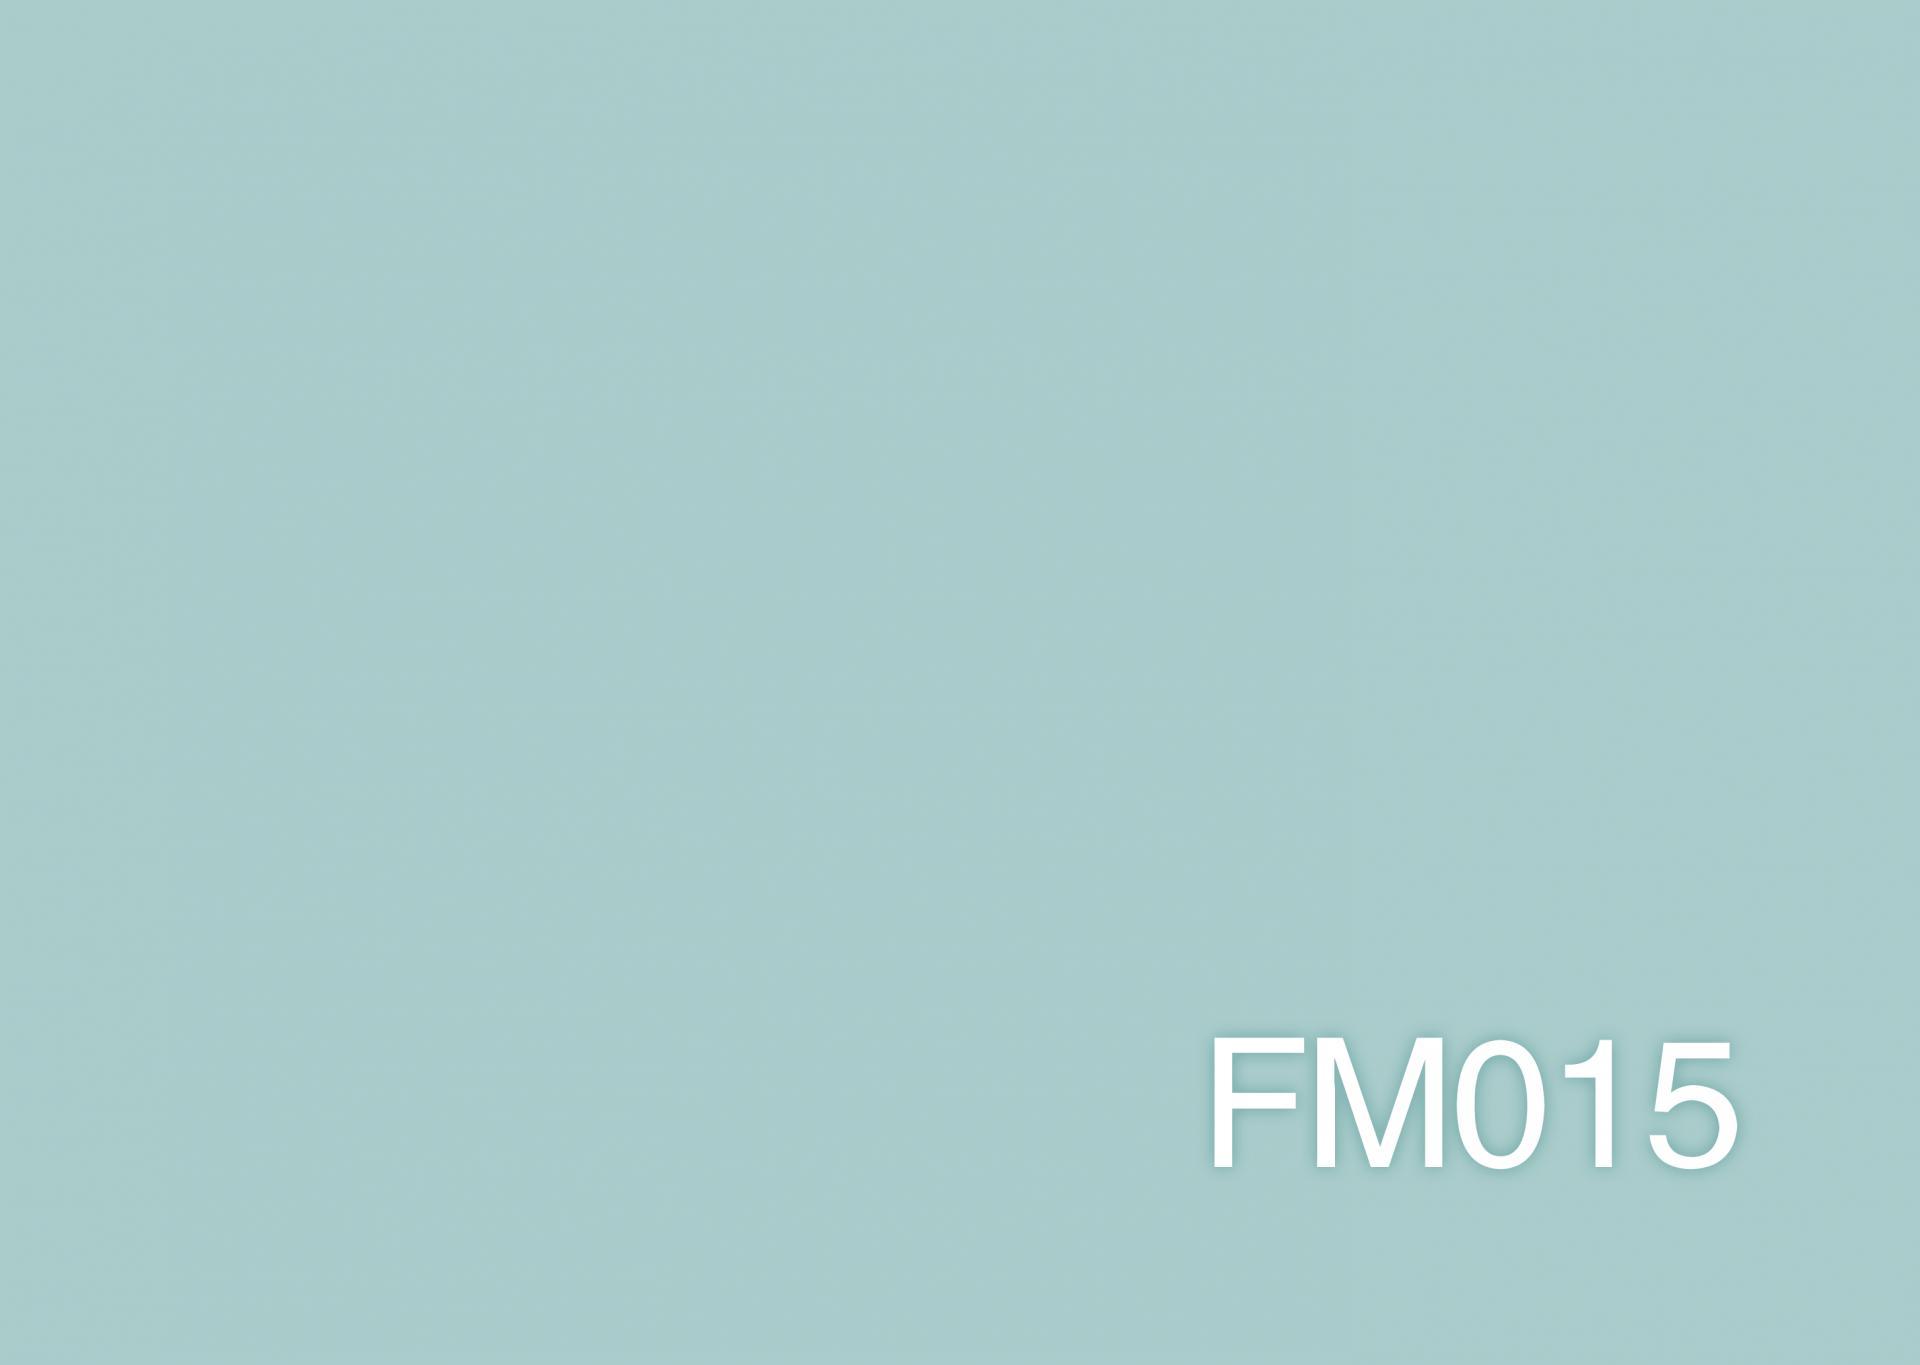 FM011点击观看色板展示全景图